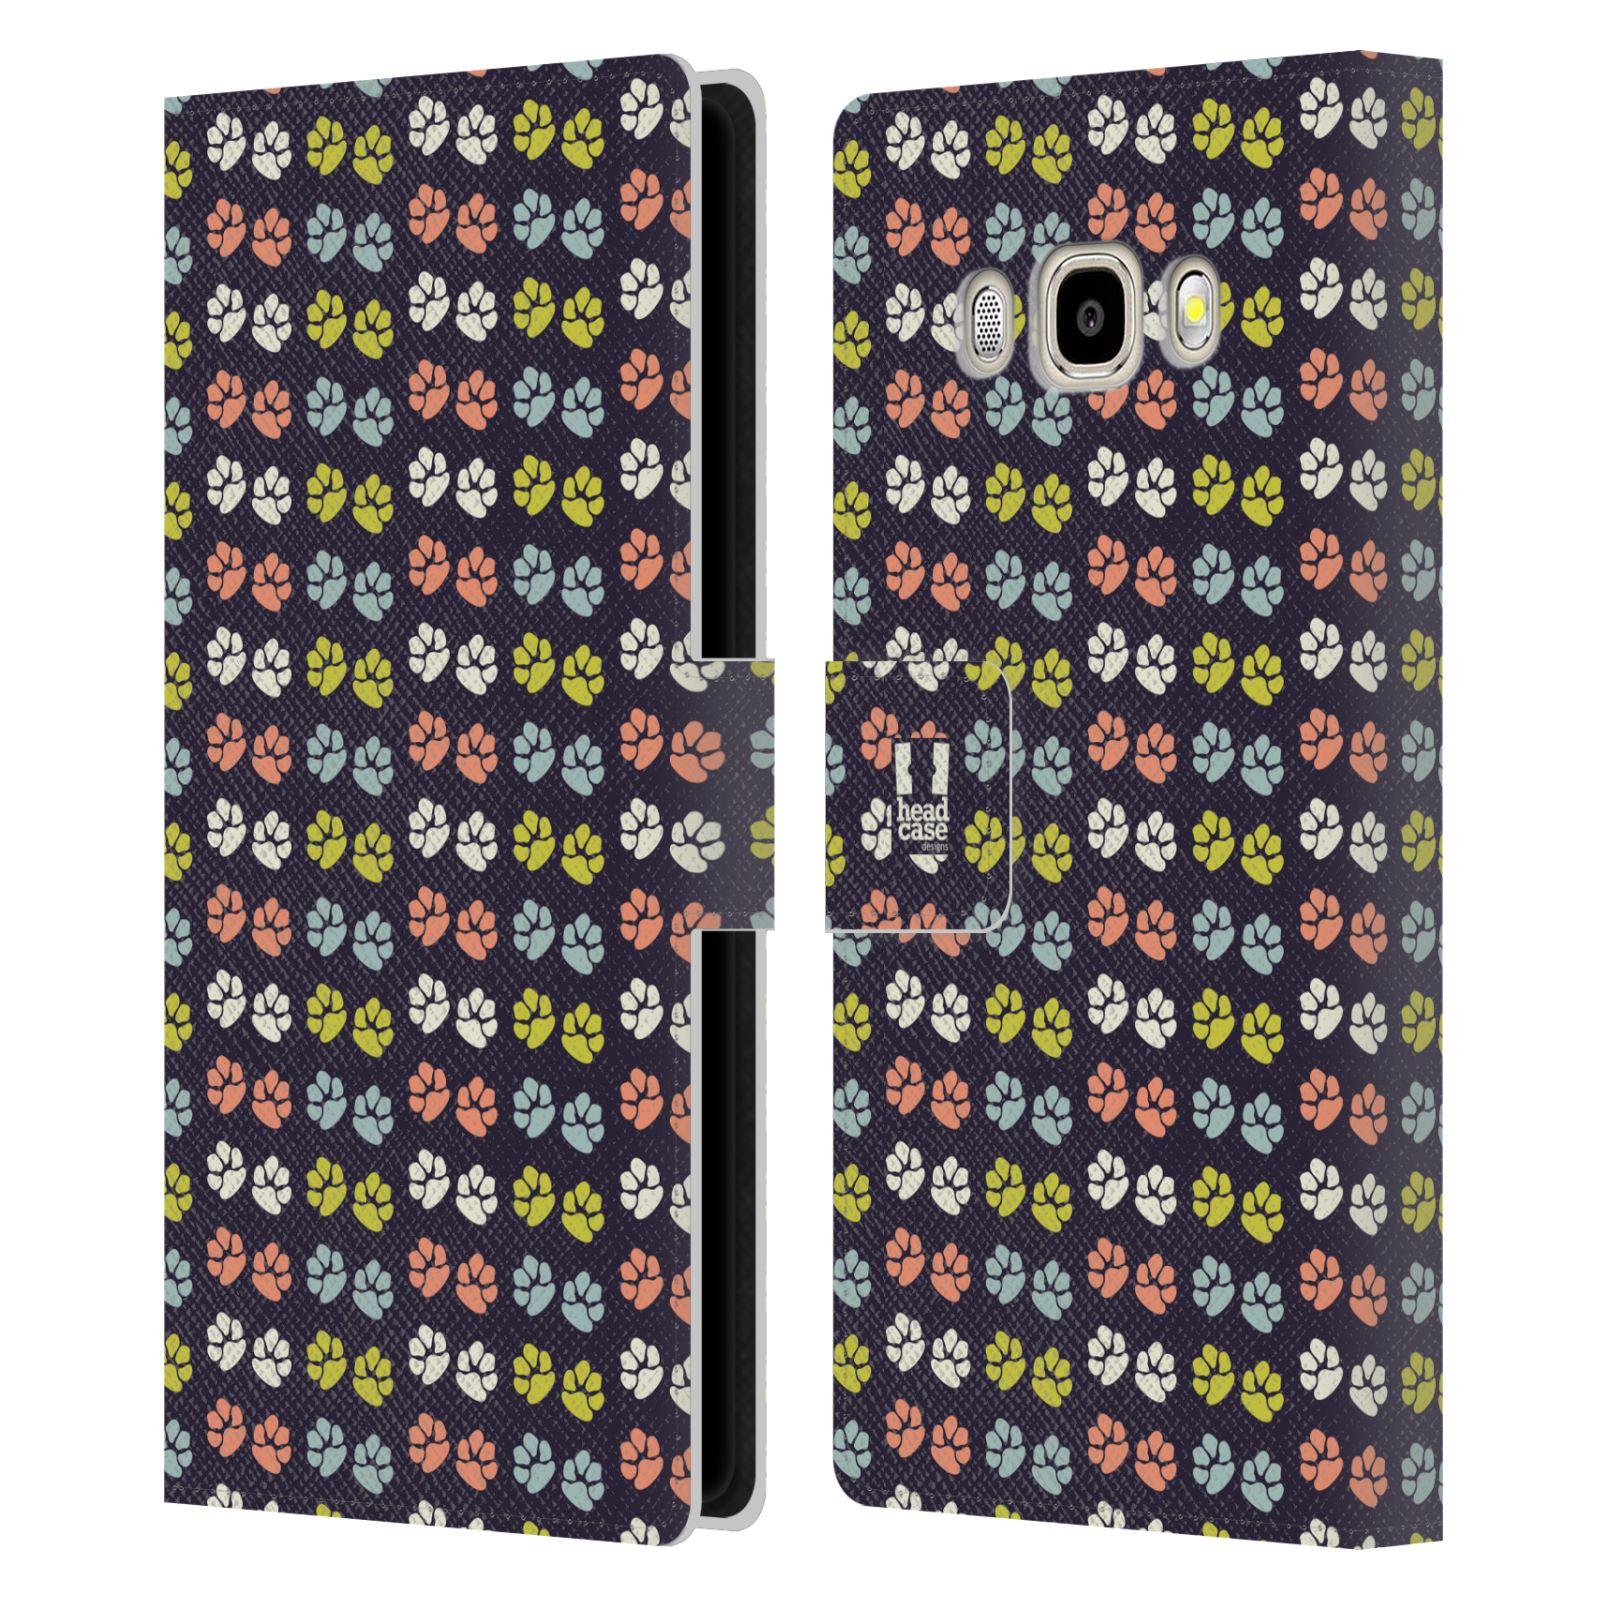 HEAD CASE Flipové pouzdro pro mobil Samsung Galaxy J5 2016 Pejsek ťapky barevné RETRO